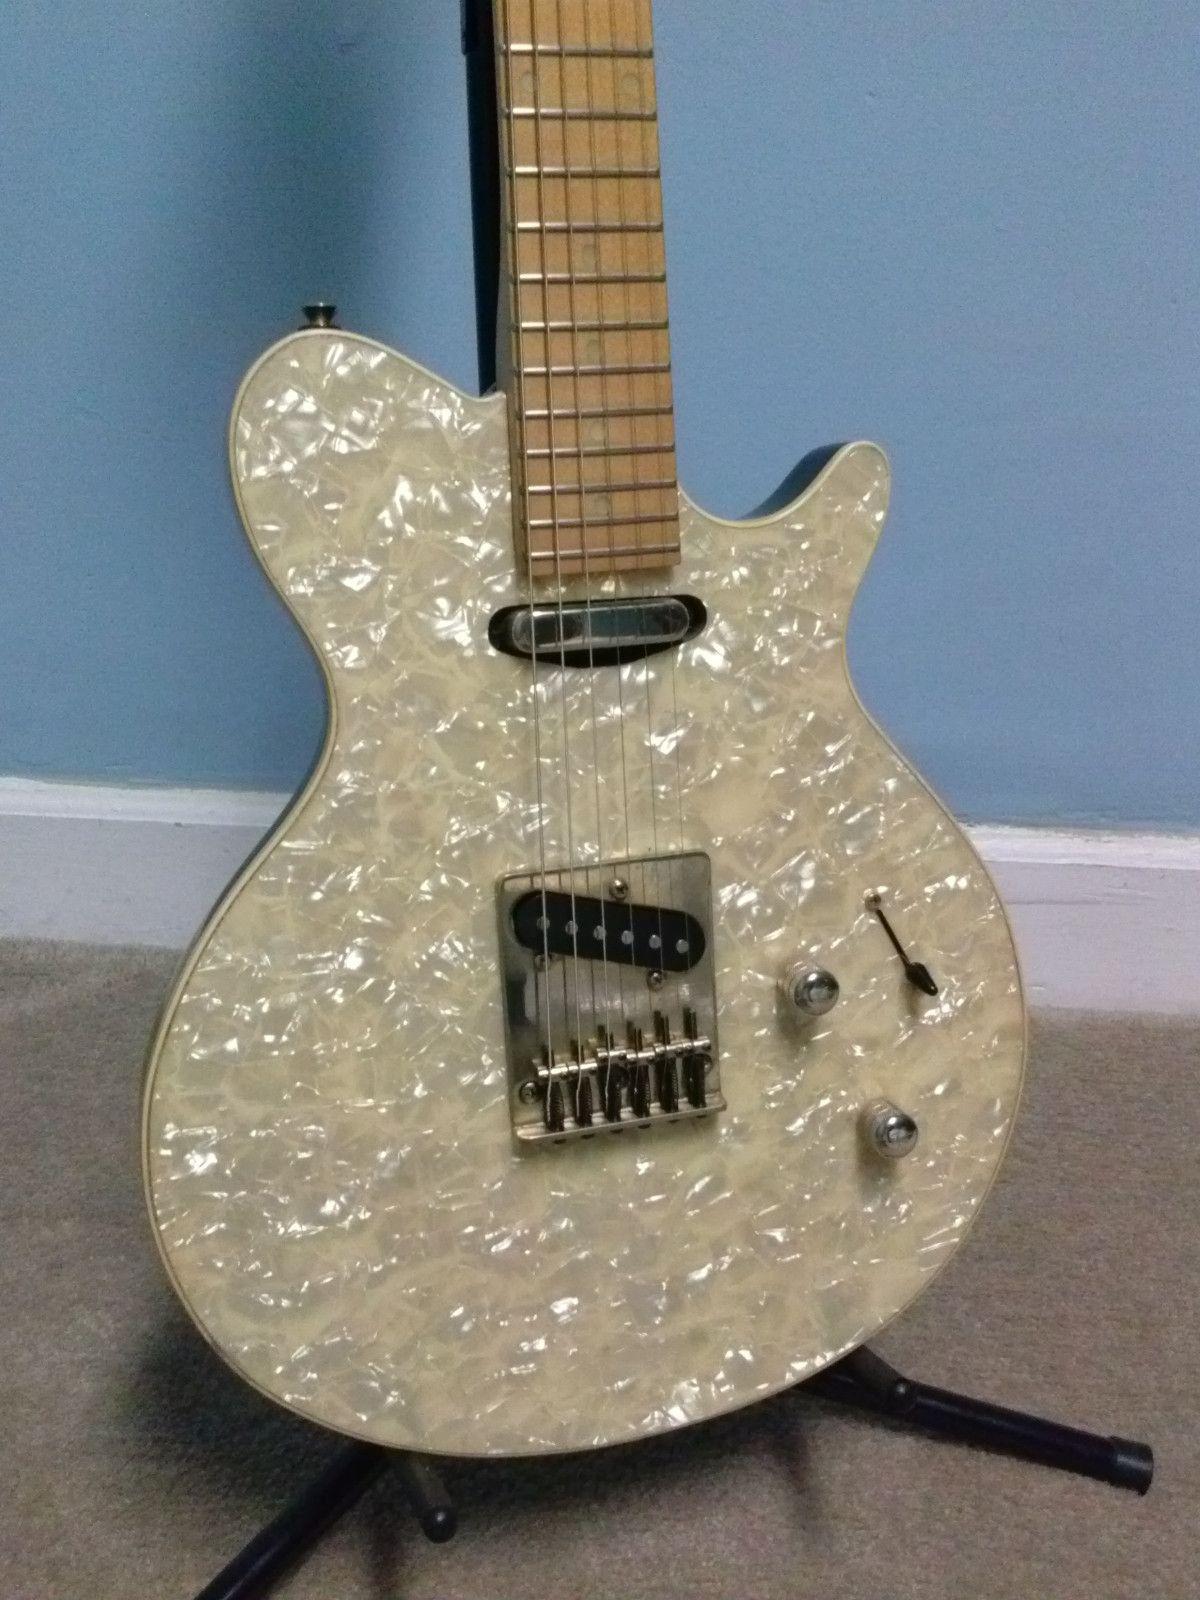 90 39 s hohner pearl electric guitar beautiful white pearl finish rare korea arty avante. Black Bedroom Furniture Sets. Home Design Ideas